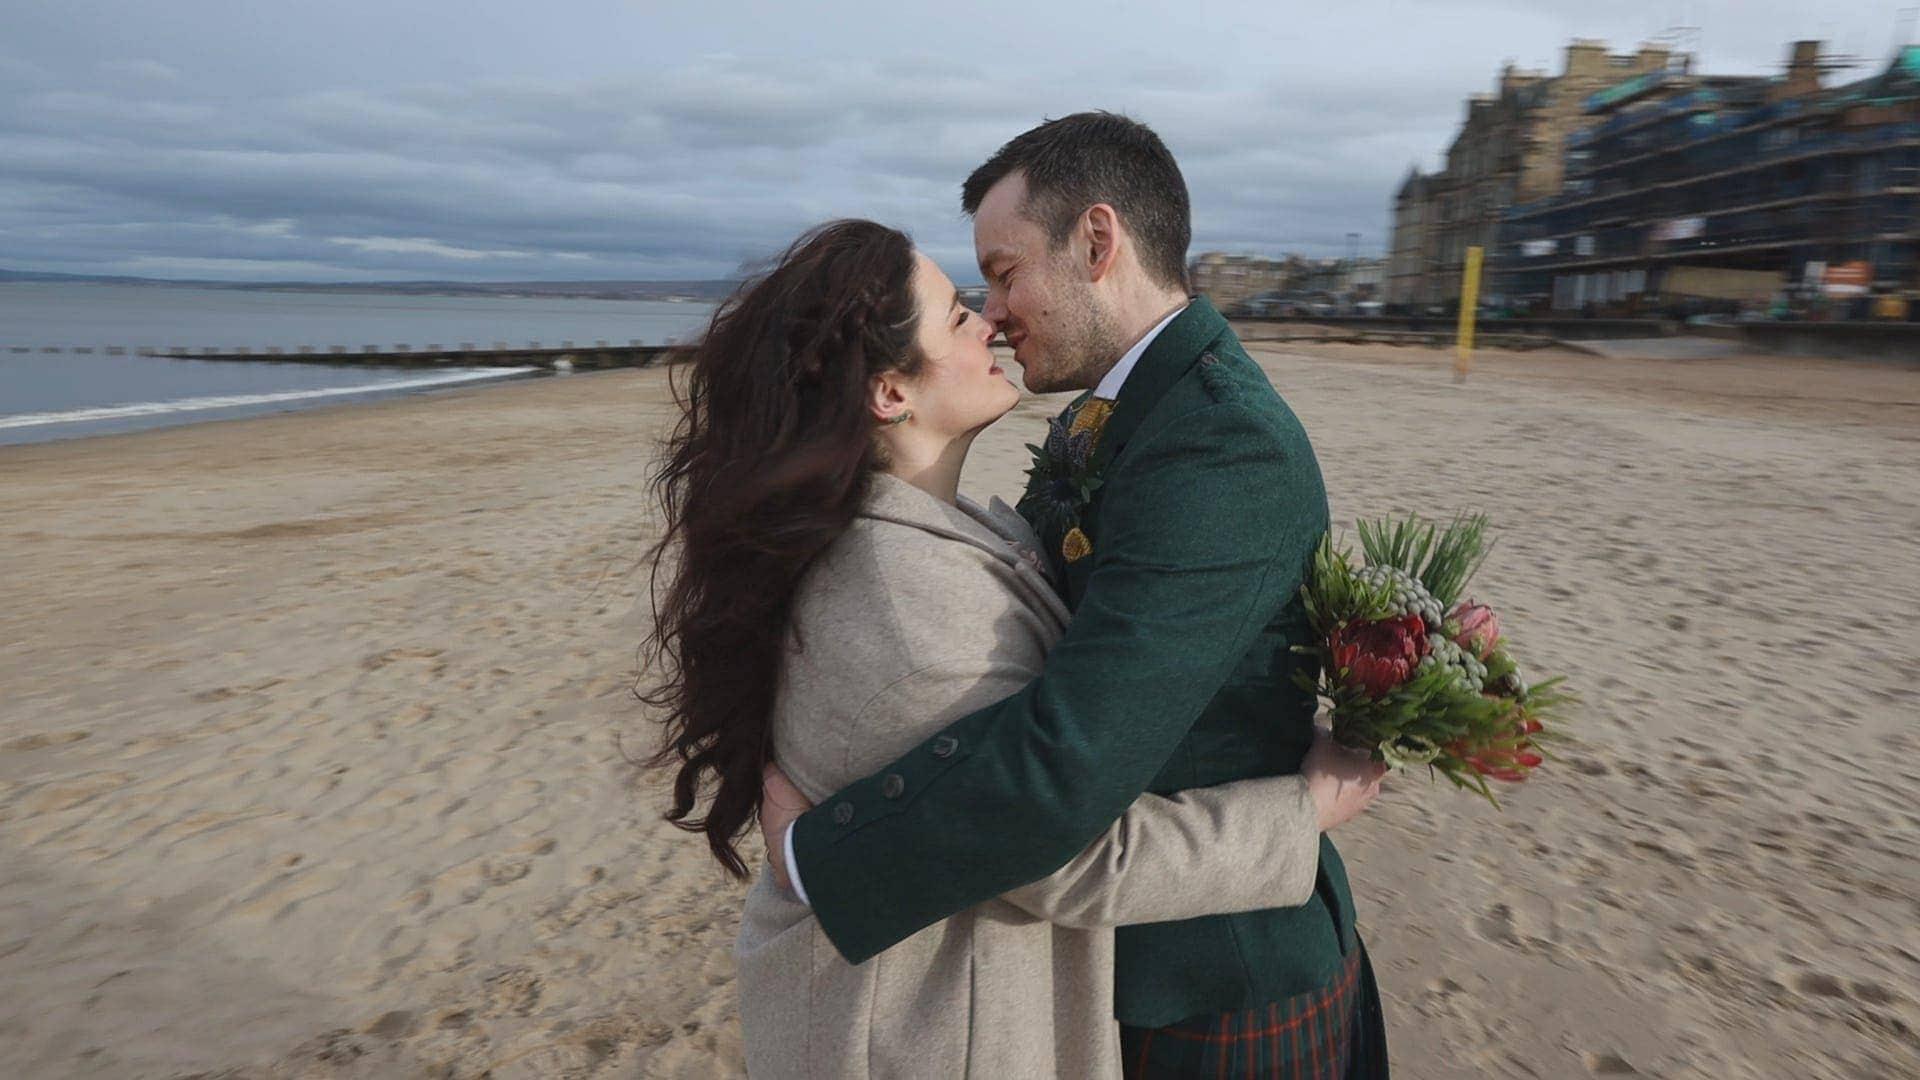 Bellfield Portobello wedding videographers in Edinburgh